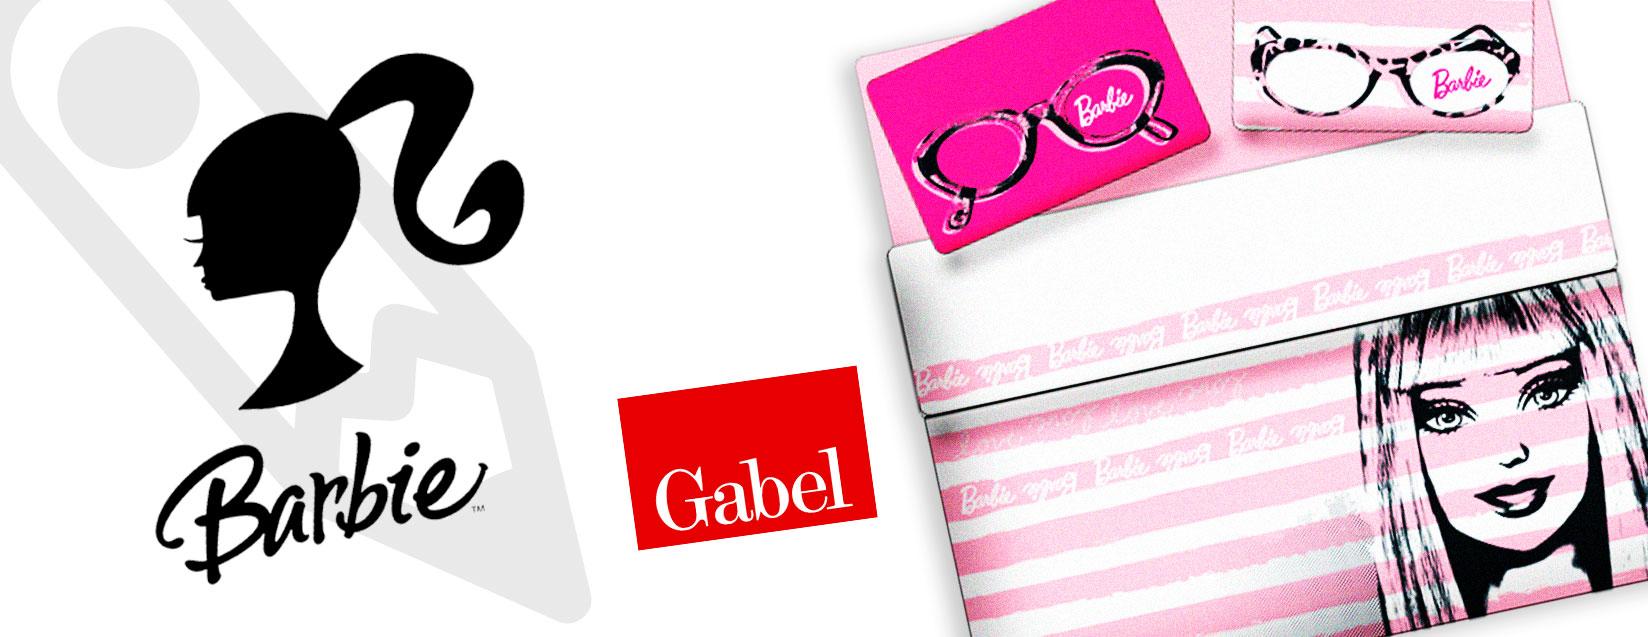 Barbie Gabel | weba05